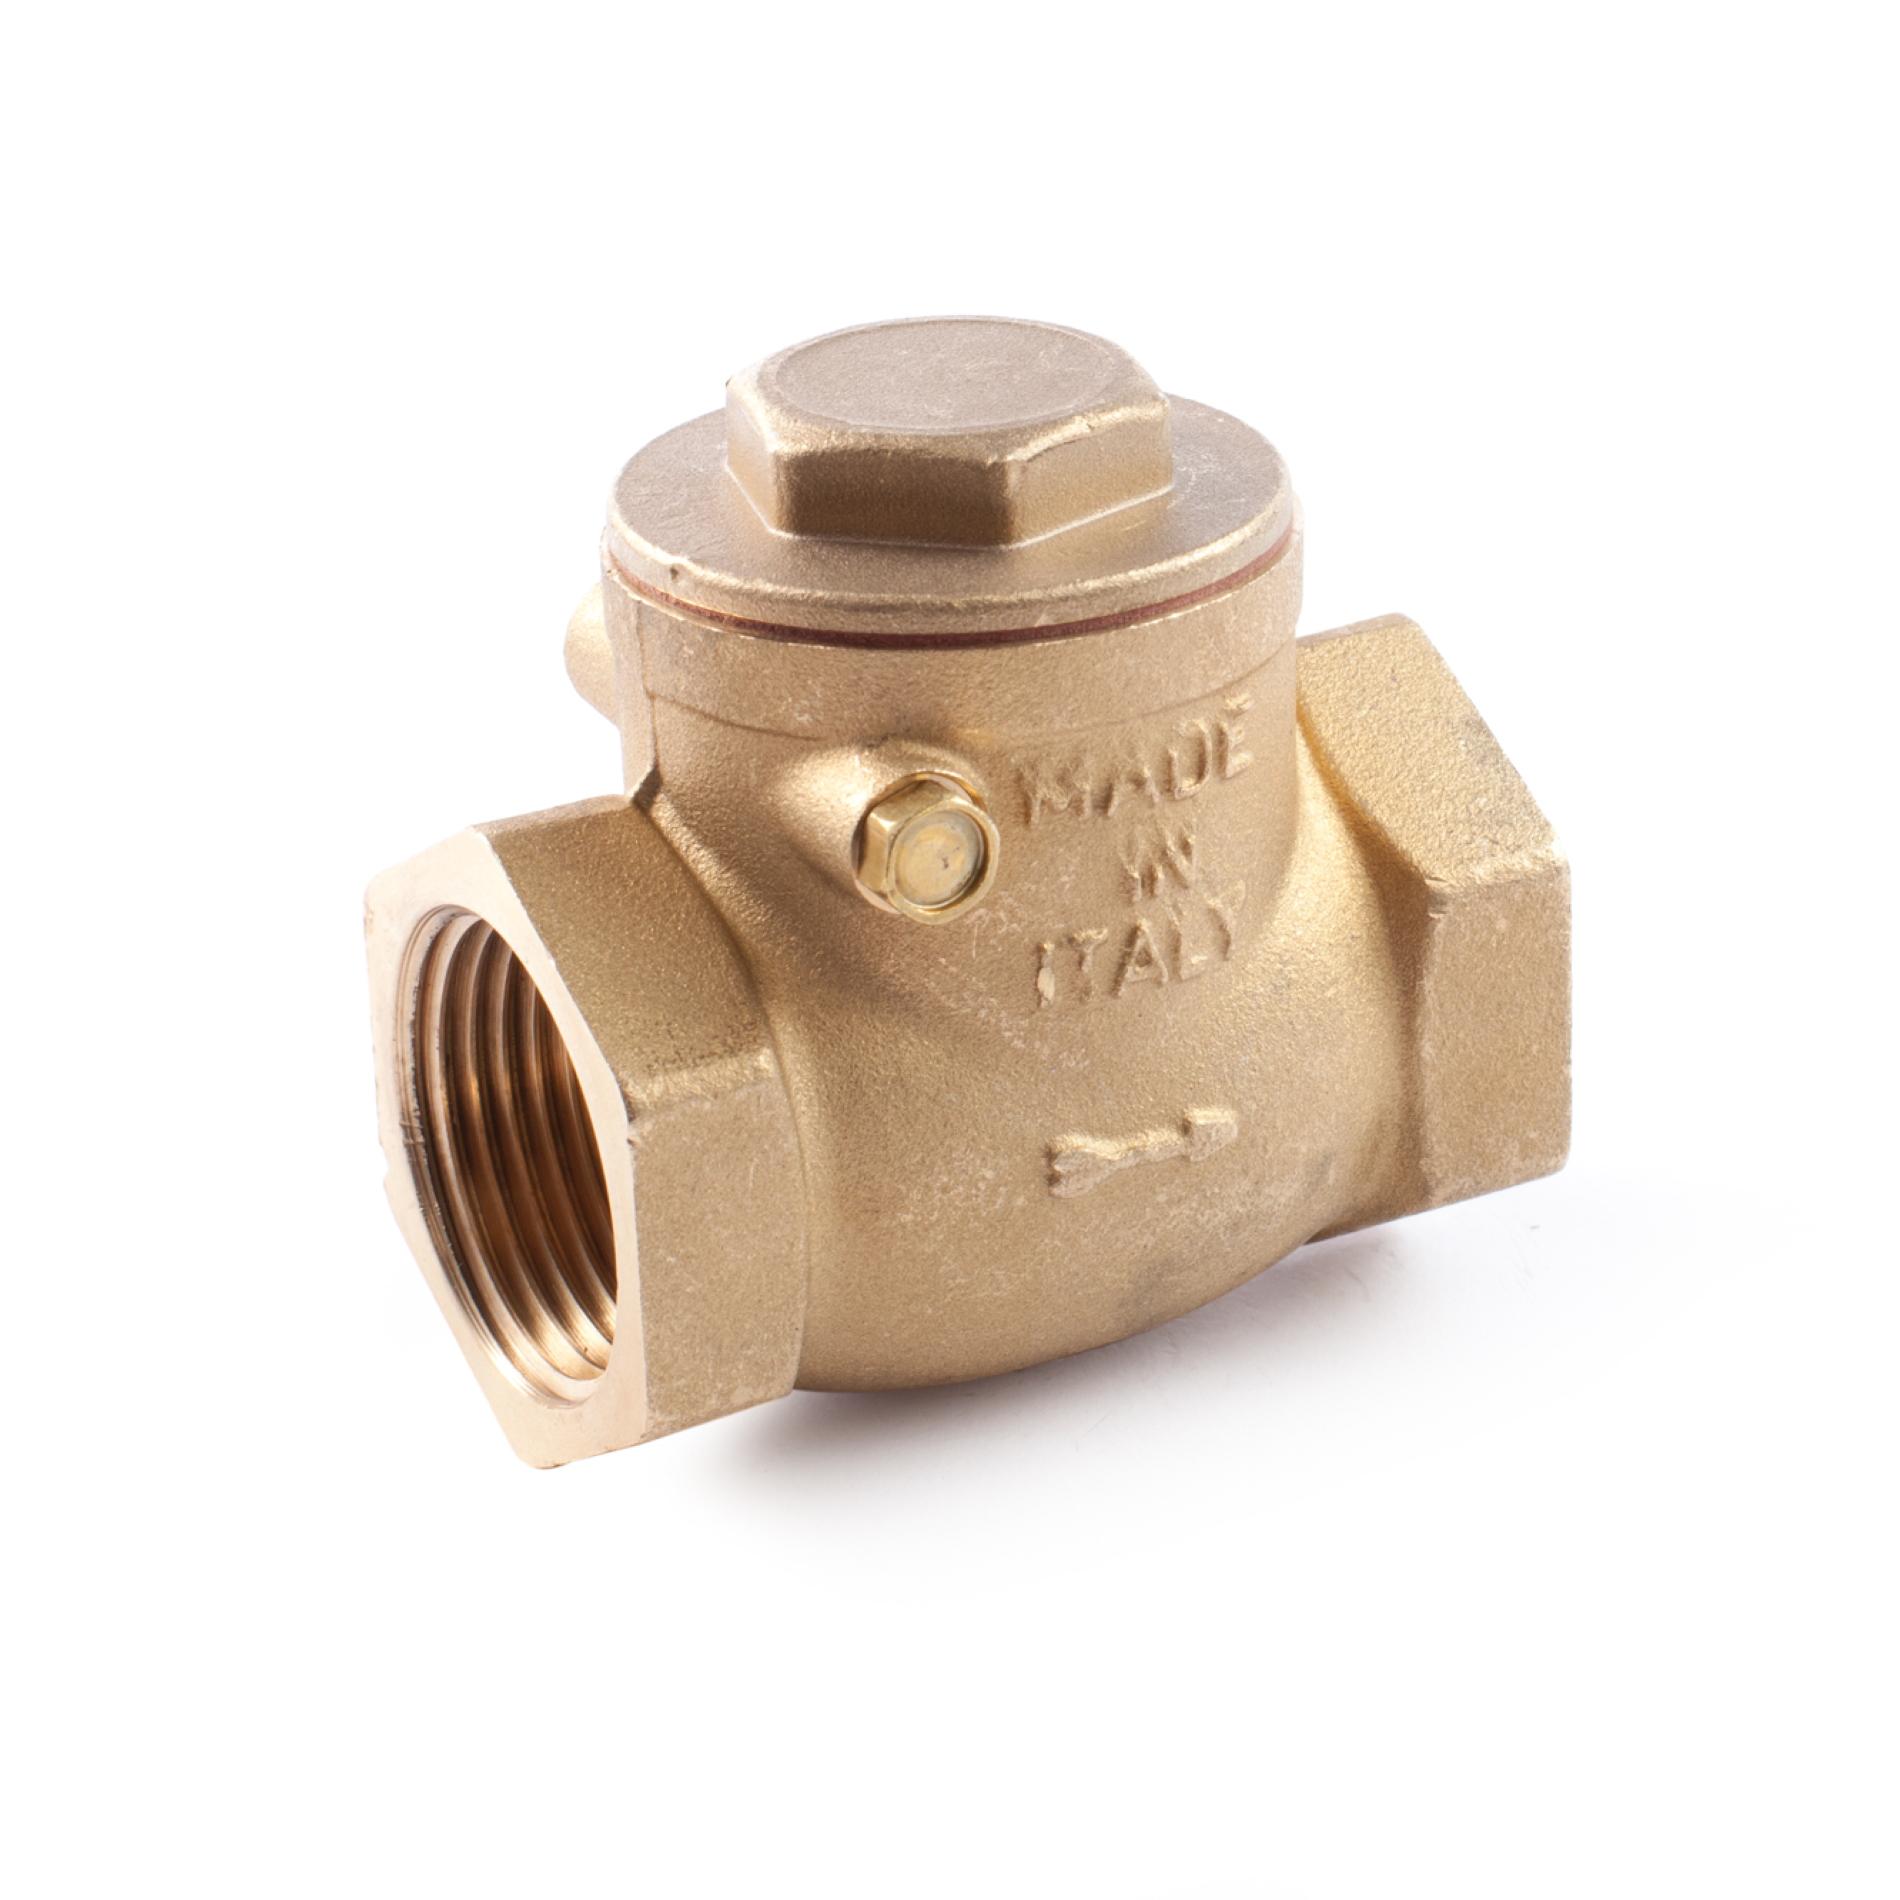 400 Valvola clapet ottone tipo pesante sede metallica Brass swing check valve heavy type metal disc